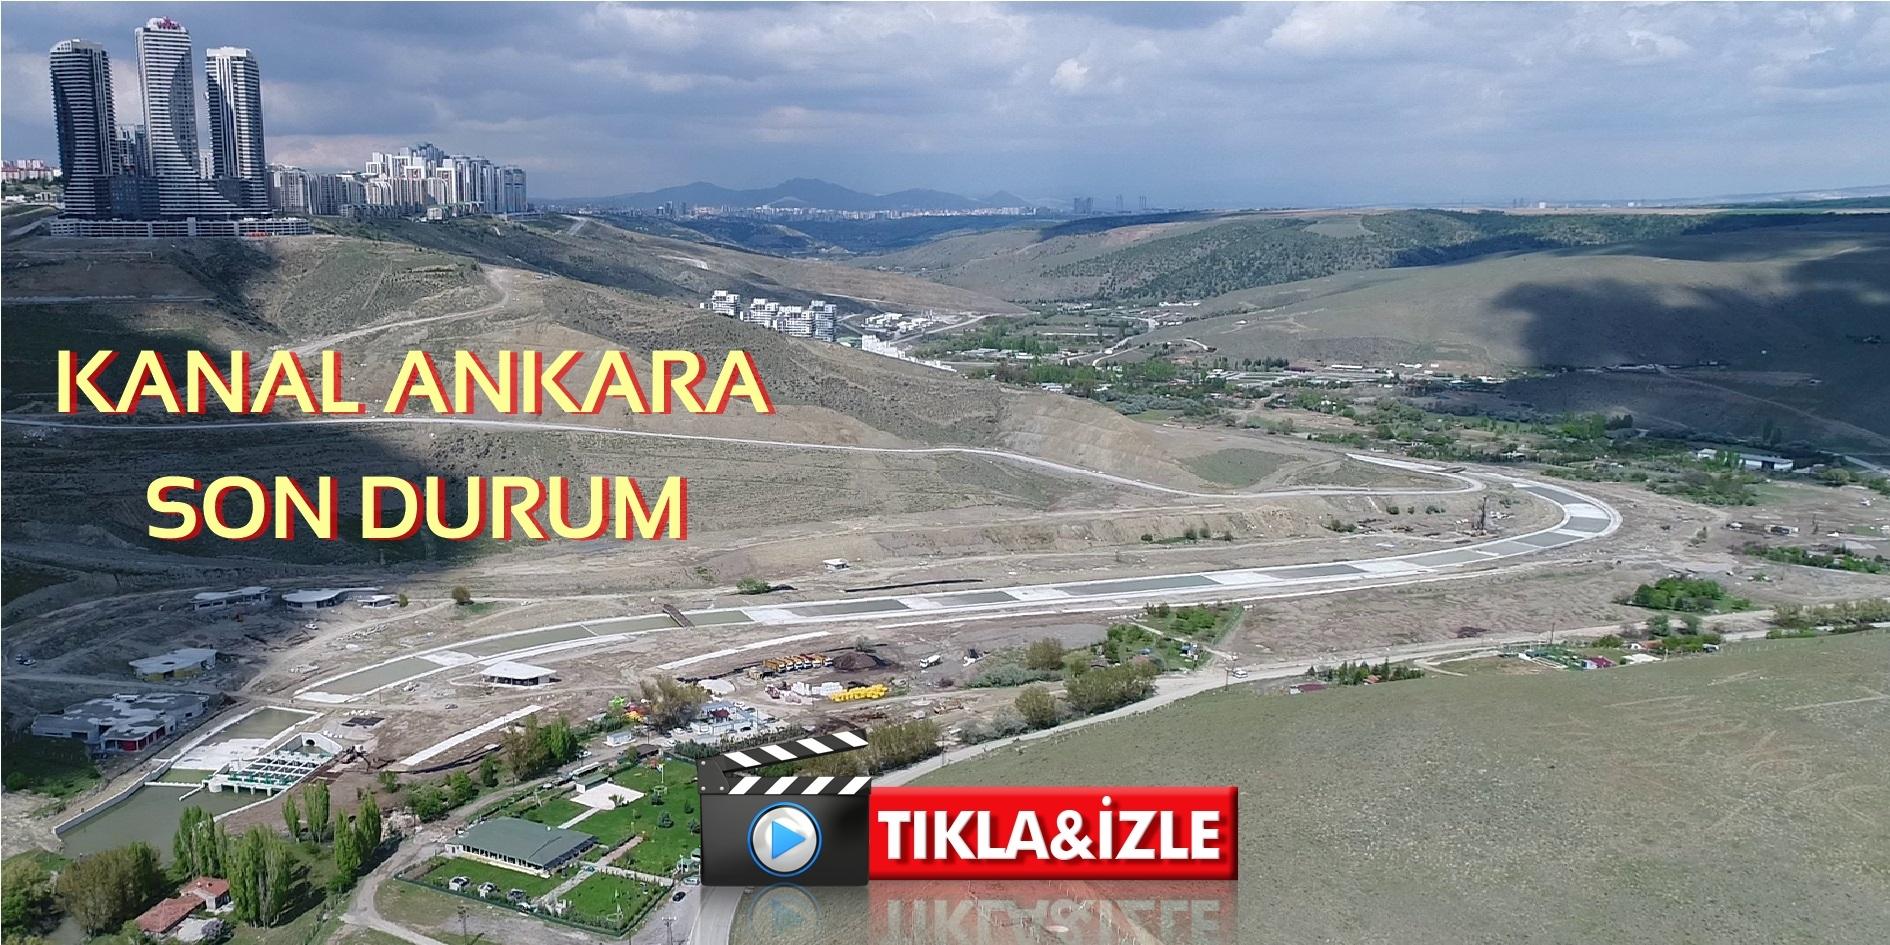 Kanal Ankara Son Durum… (Mayıs 2020)